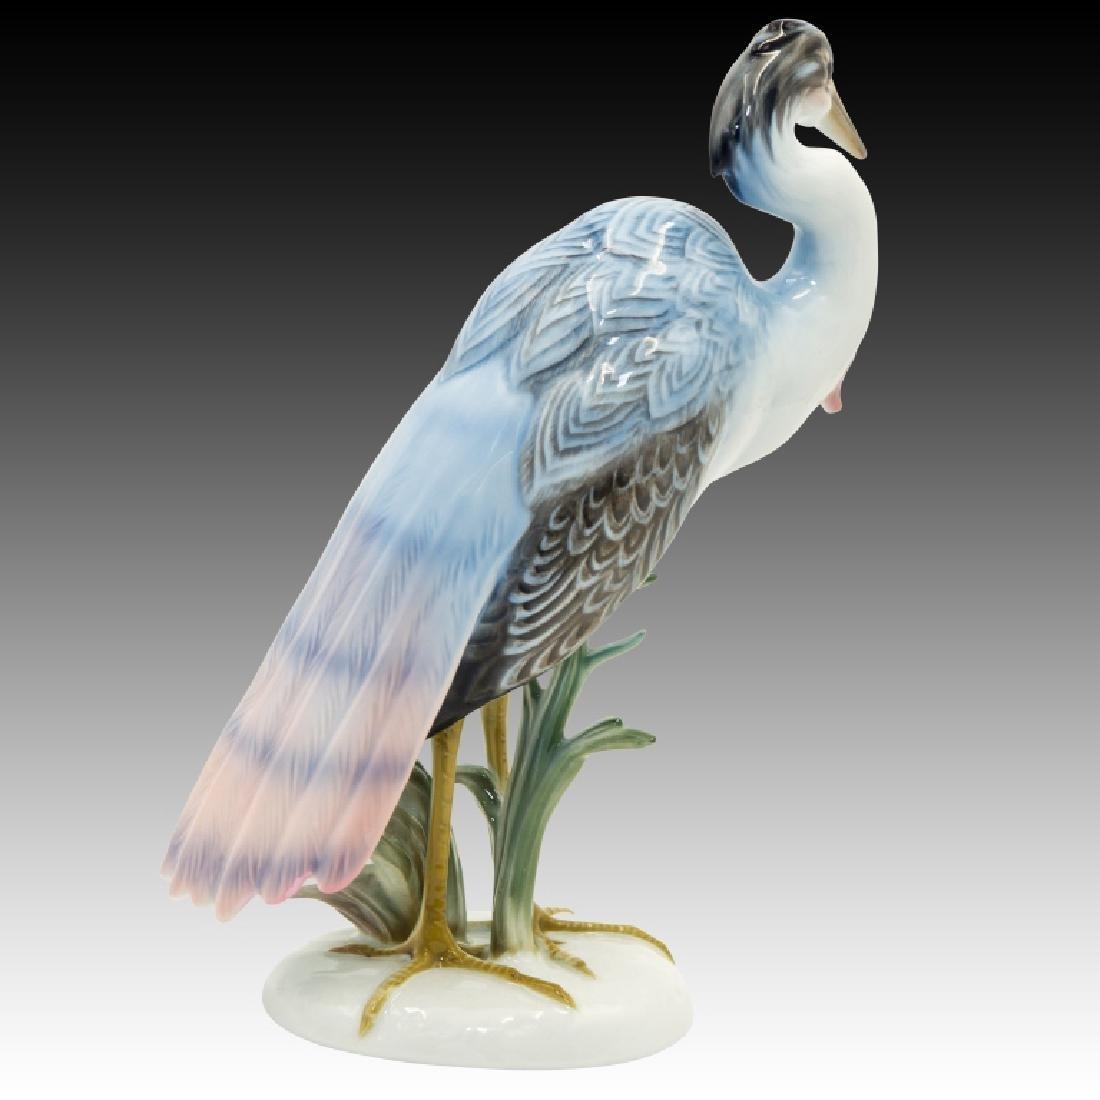 Rosenthal Large Heron Figurine - 3